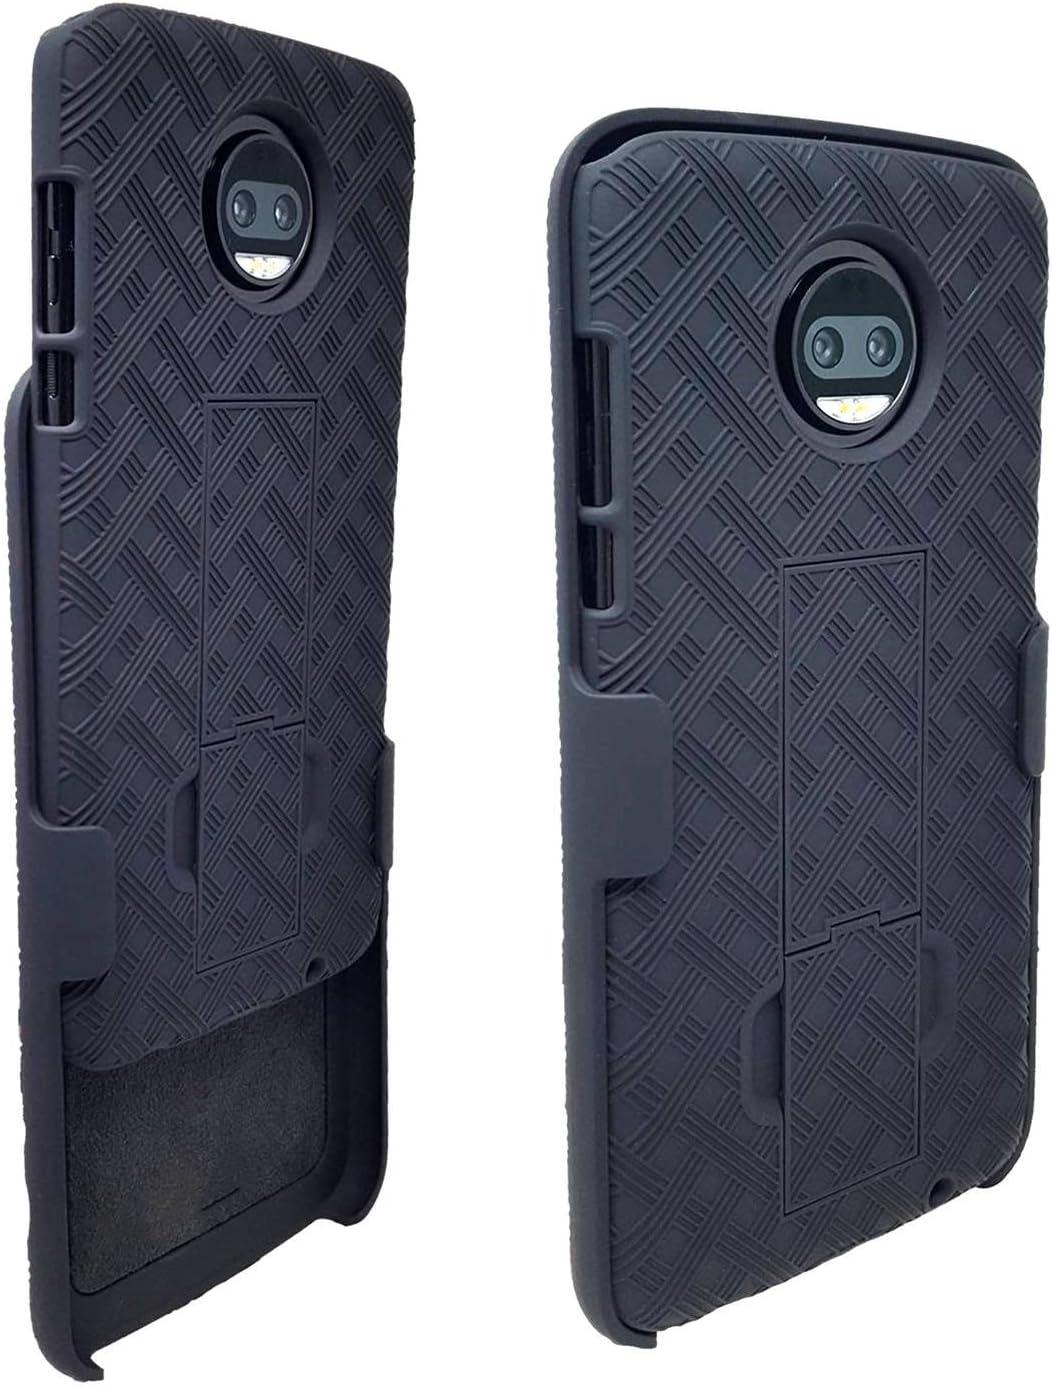 Moto Z2Force Case with Belt Clip Combo Shell Holster Black HAGEN